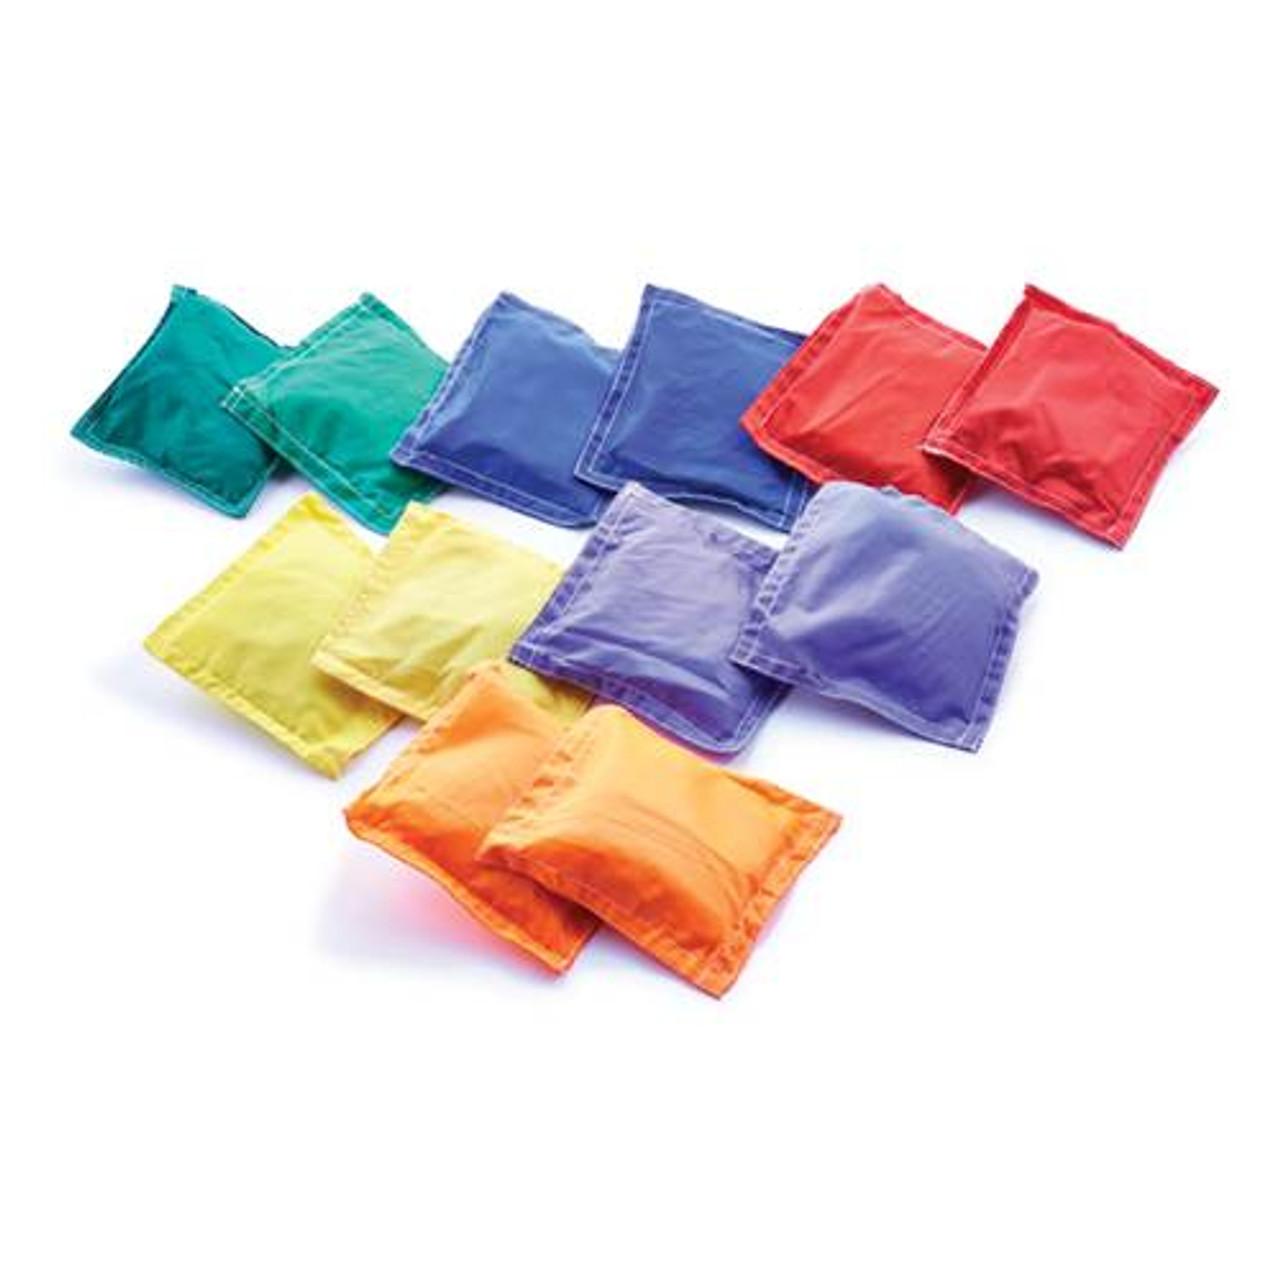 "GameCraft 5"" Nylon Bean Bags - Prism Pack"